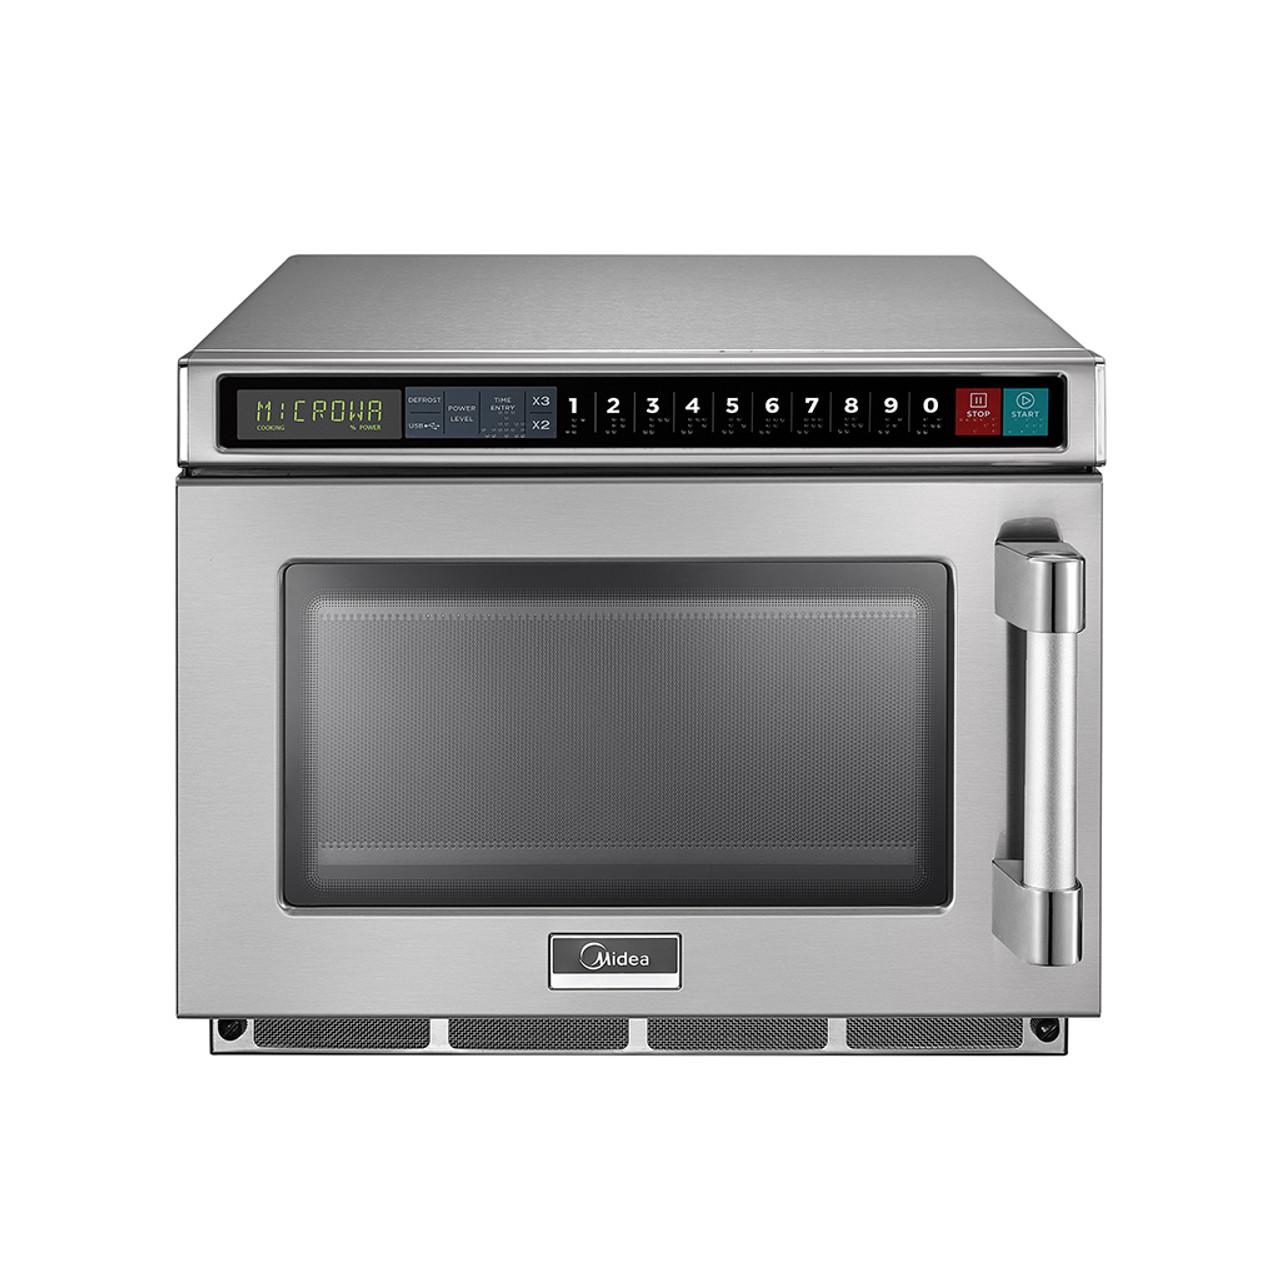 midea 2117g1a 0 6 cu ft 2100w push button commercial microwave 208v